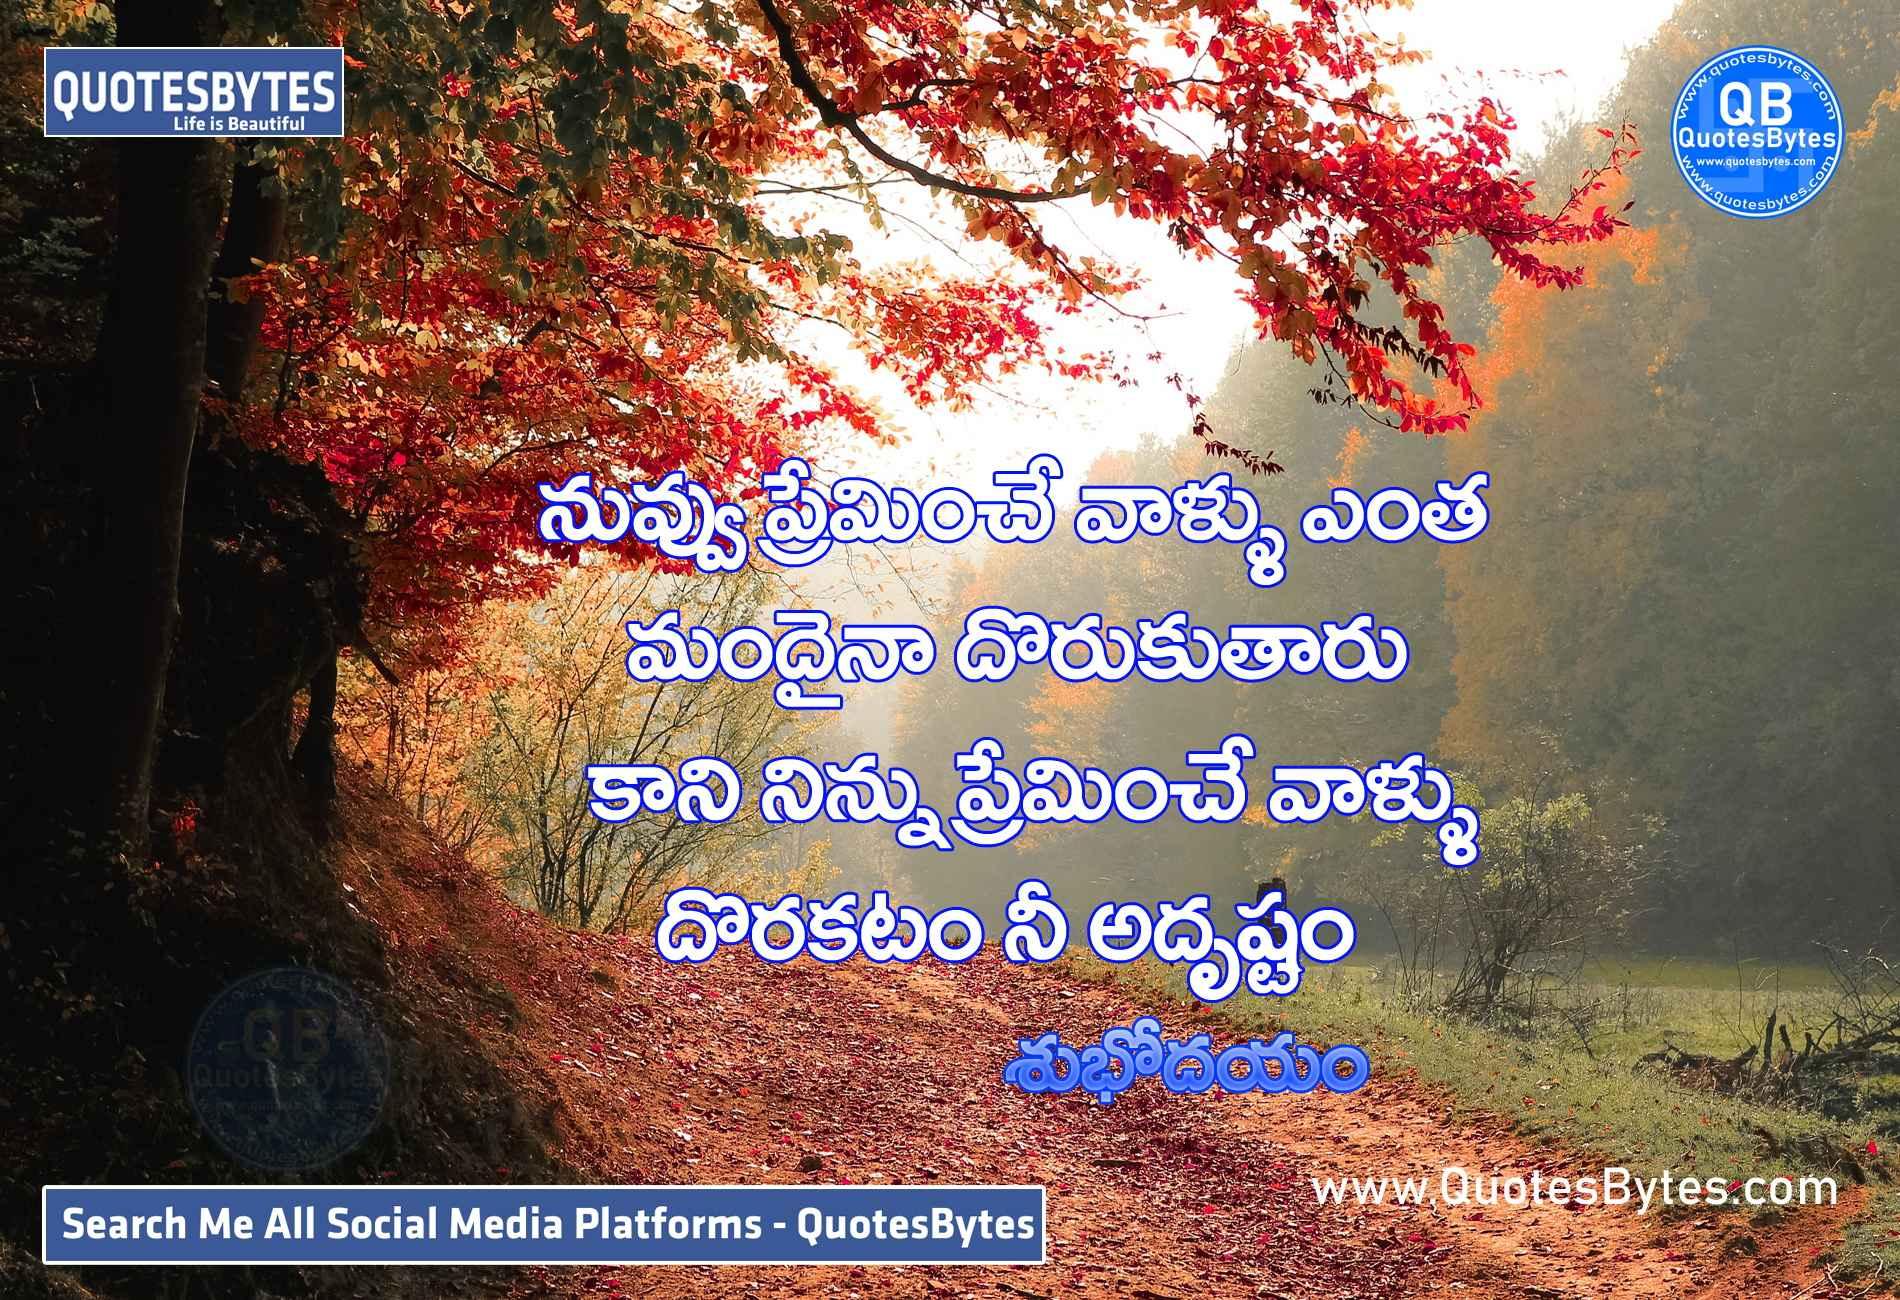 good morning images in telugu-good morning telugu quotes images